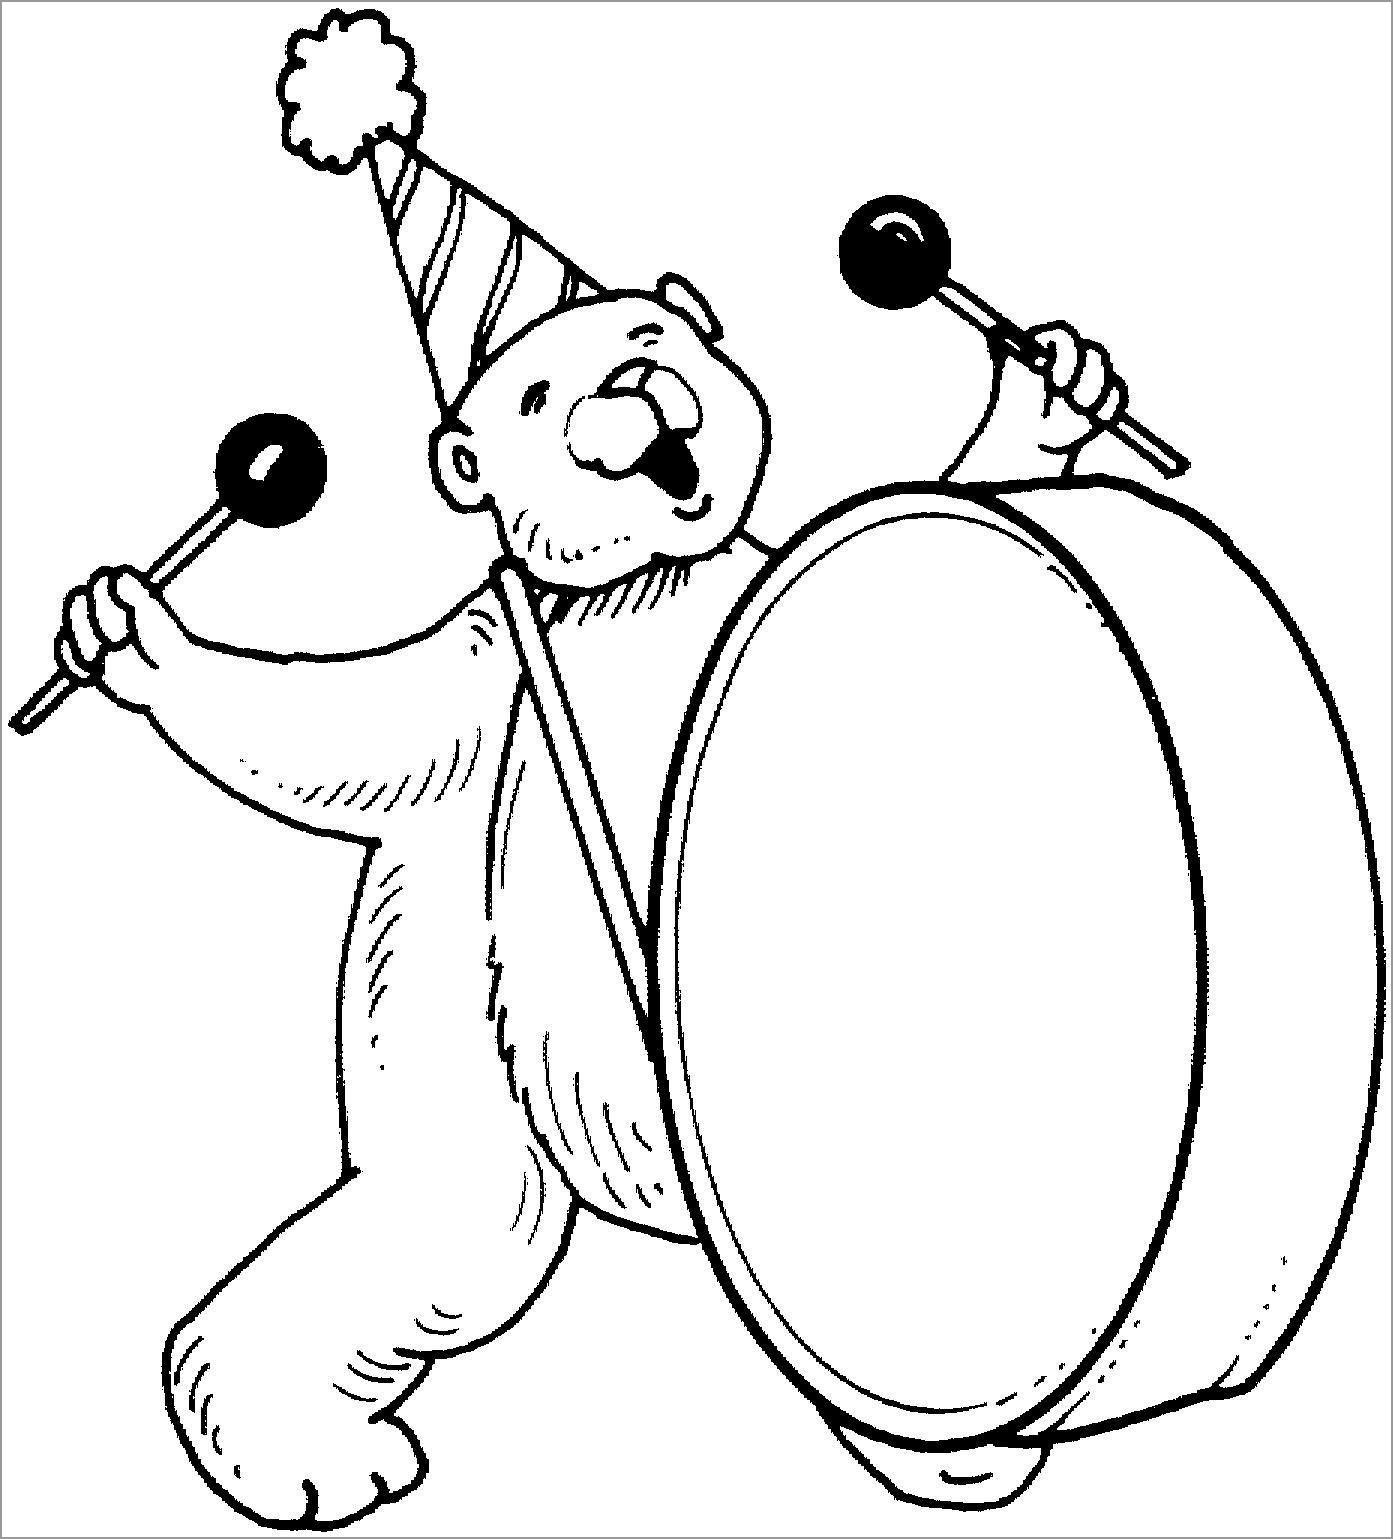 Bear Circus Animal Coloring Page